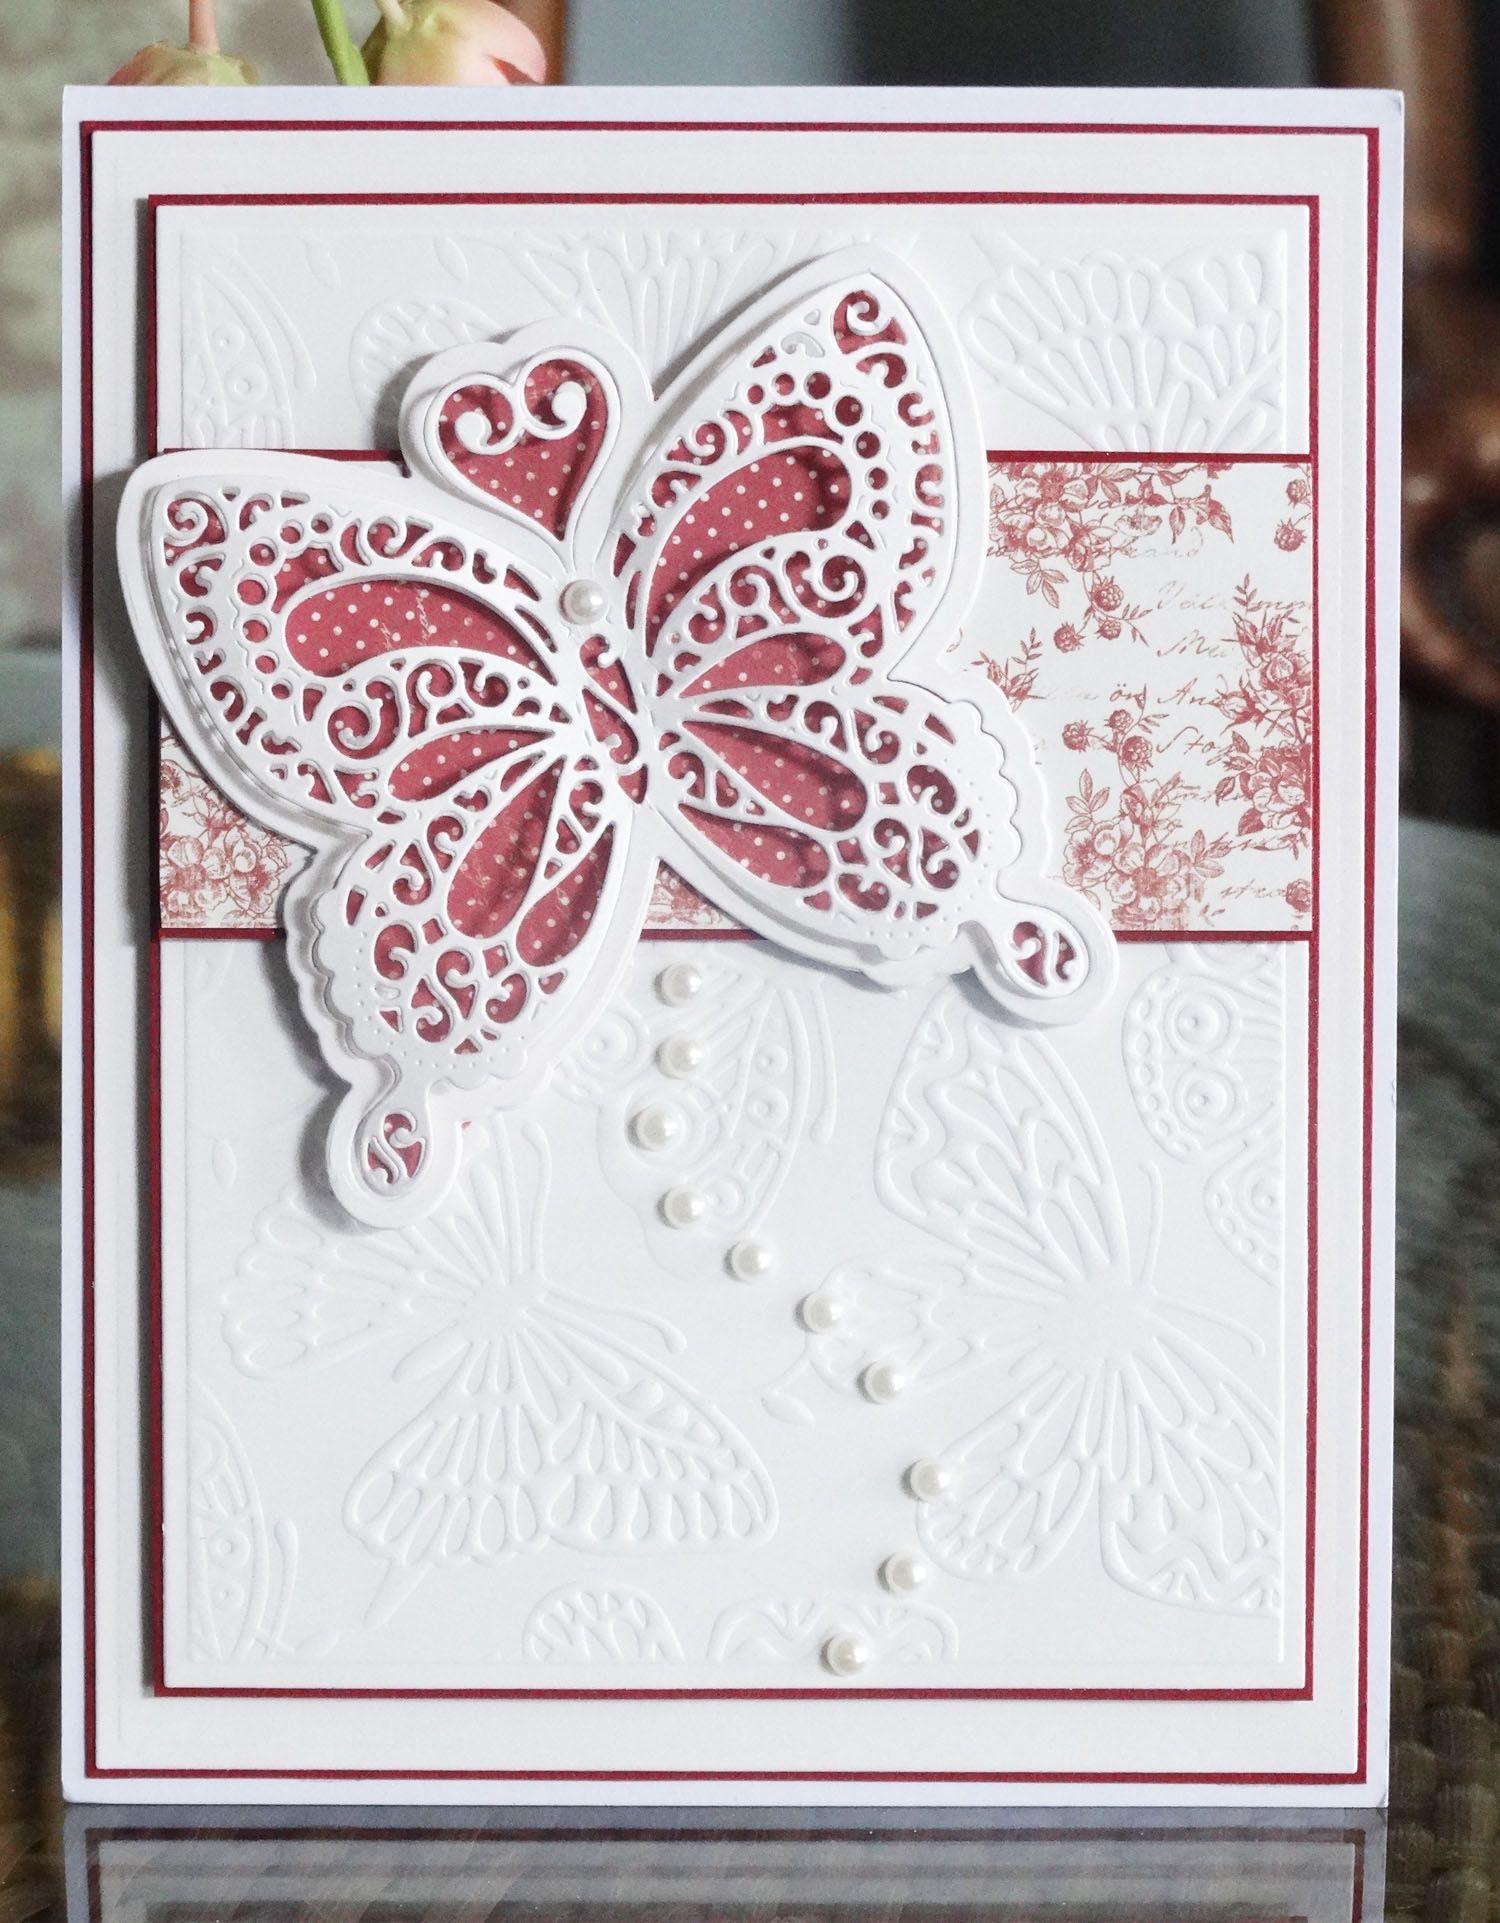 Brand new kaleidoscope collection from tattered lace dies www brand new kaleidoscope collection from tattered lace dies tatteredlace wedding cards handmadegreeting kristyandbryce Images